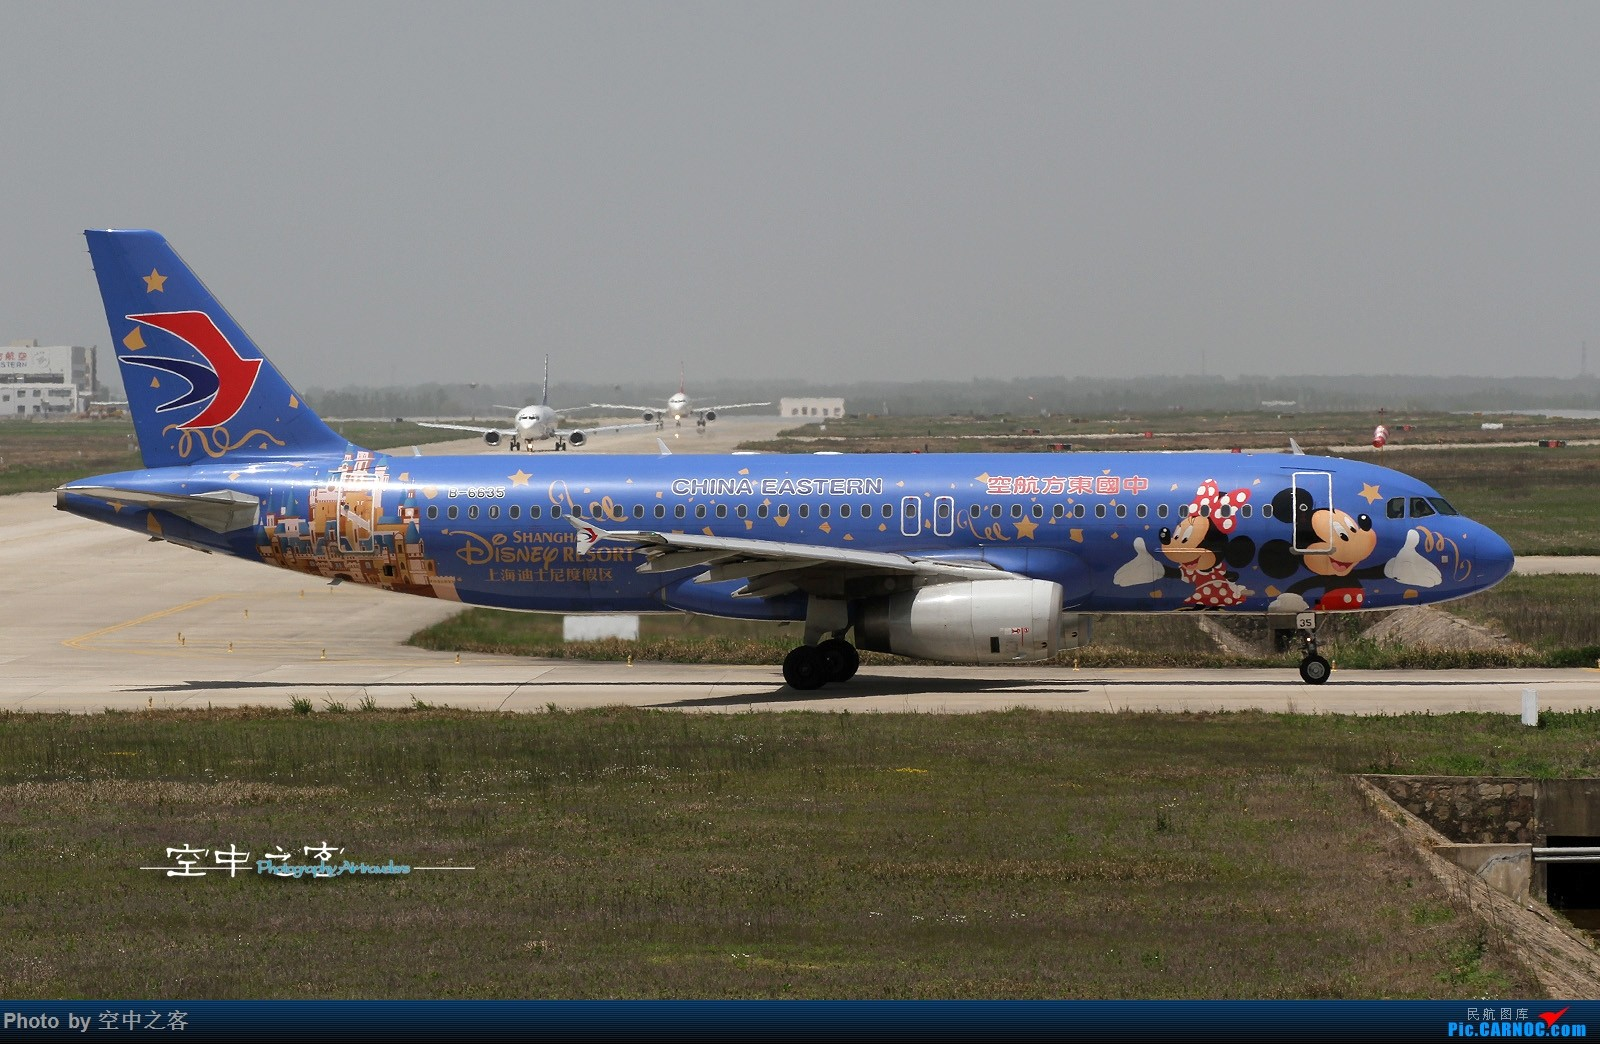 Re:[原创][合肥飞友会·霸都打机队]空中之客出品 大佬们都回来了 我还在新机场看小小米老鼠迪斯尼装飞机 AIRBUS A320-200 B-6635 合肥新桥国际机场